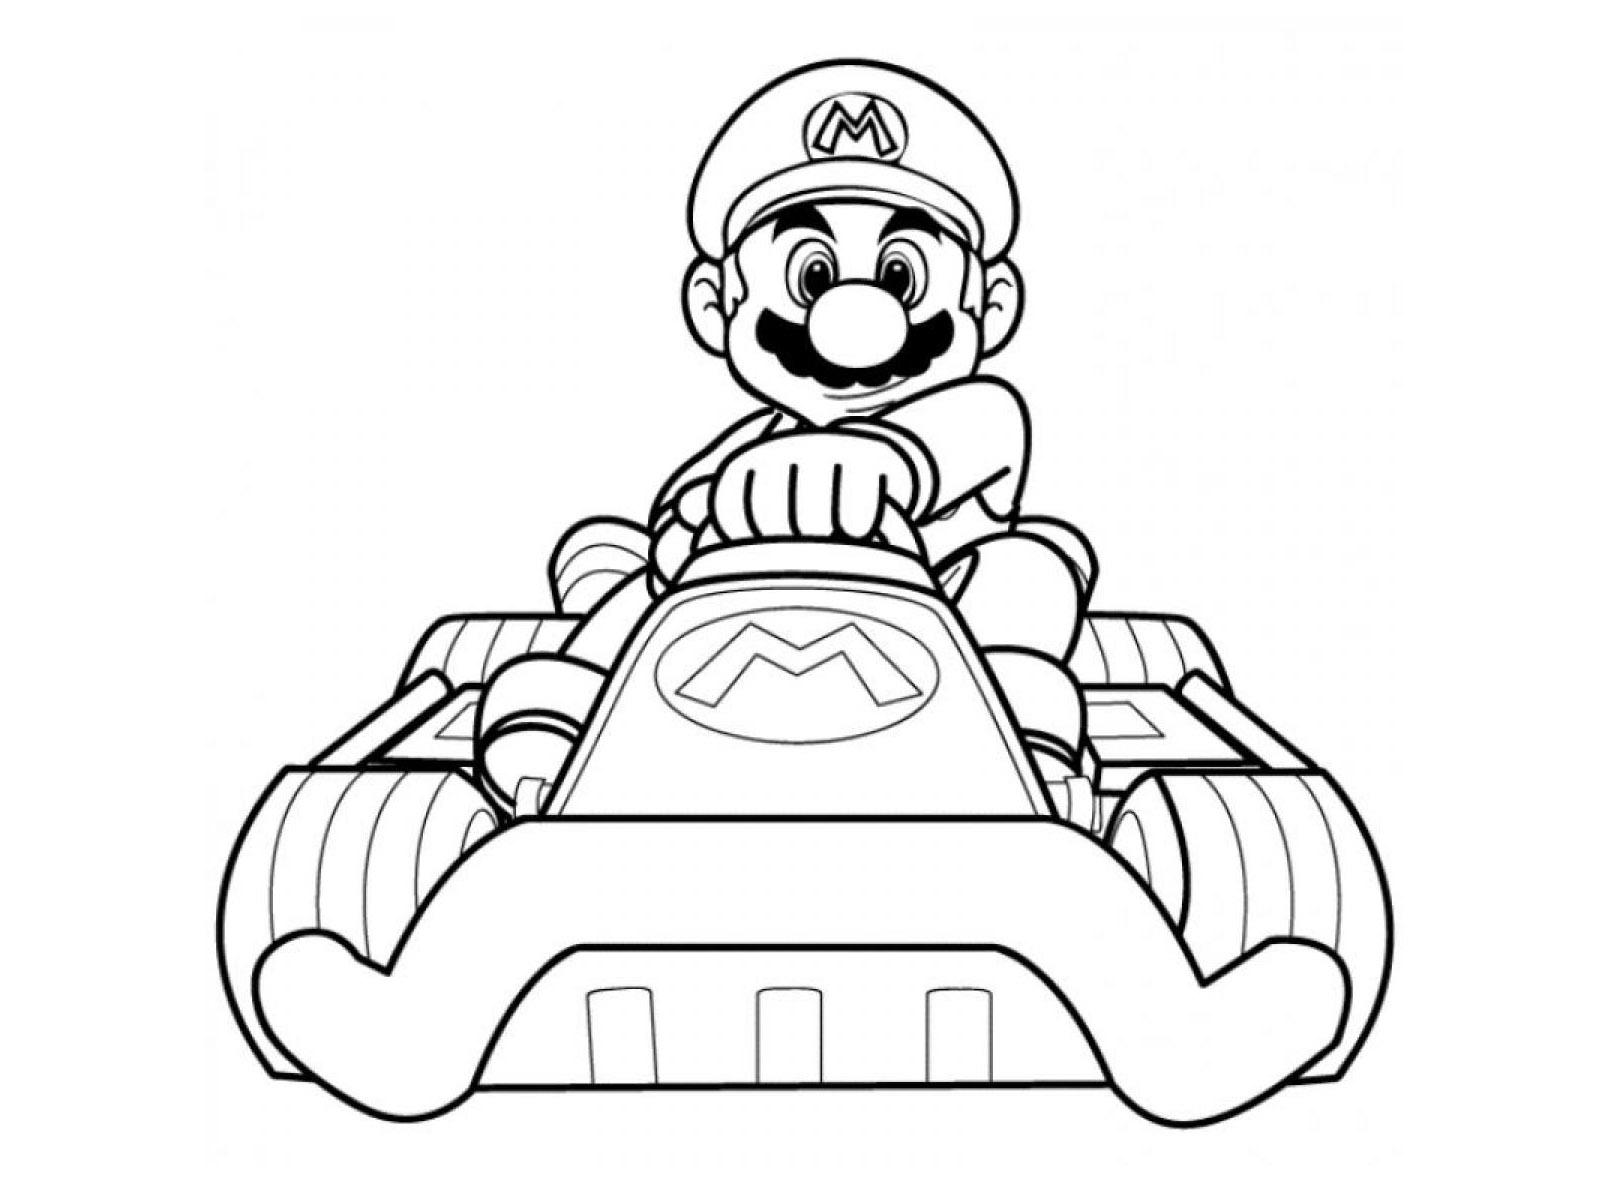 Mario Coloring Pages To Print Mario Kart Free To Color For Kids Mario Kart Kids Coloring Pages